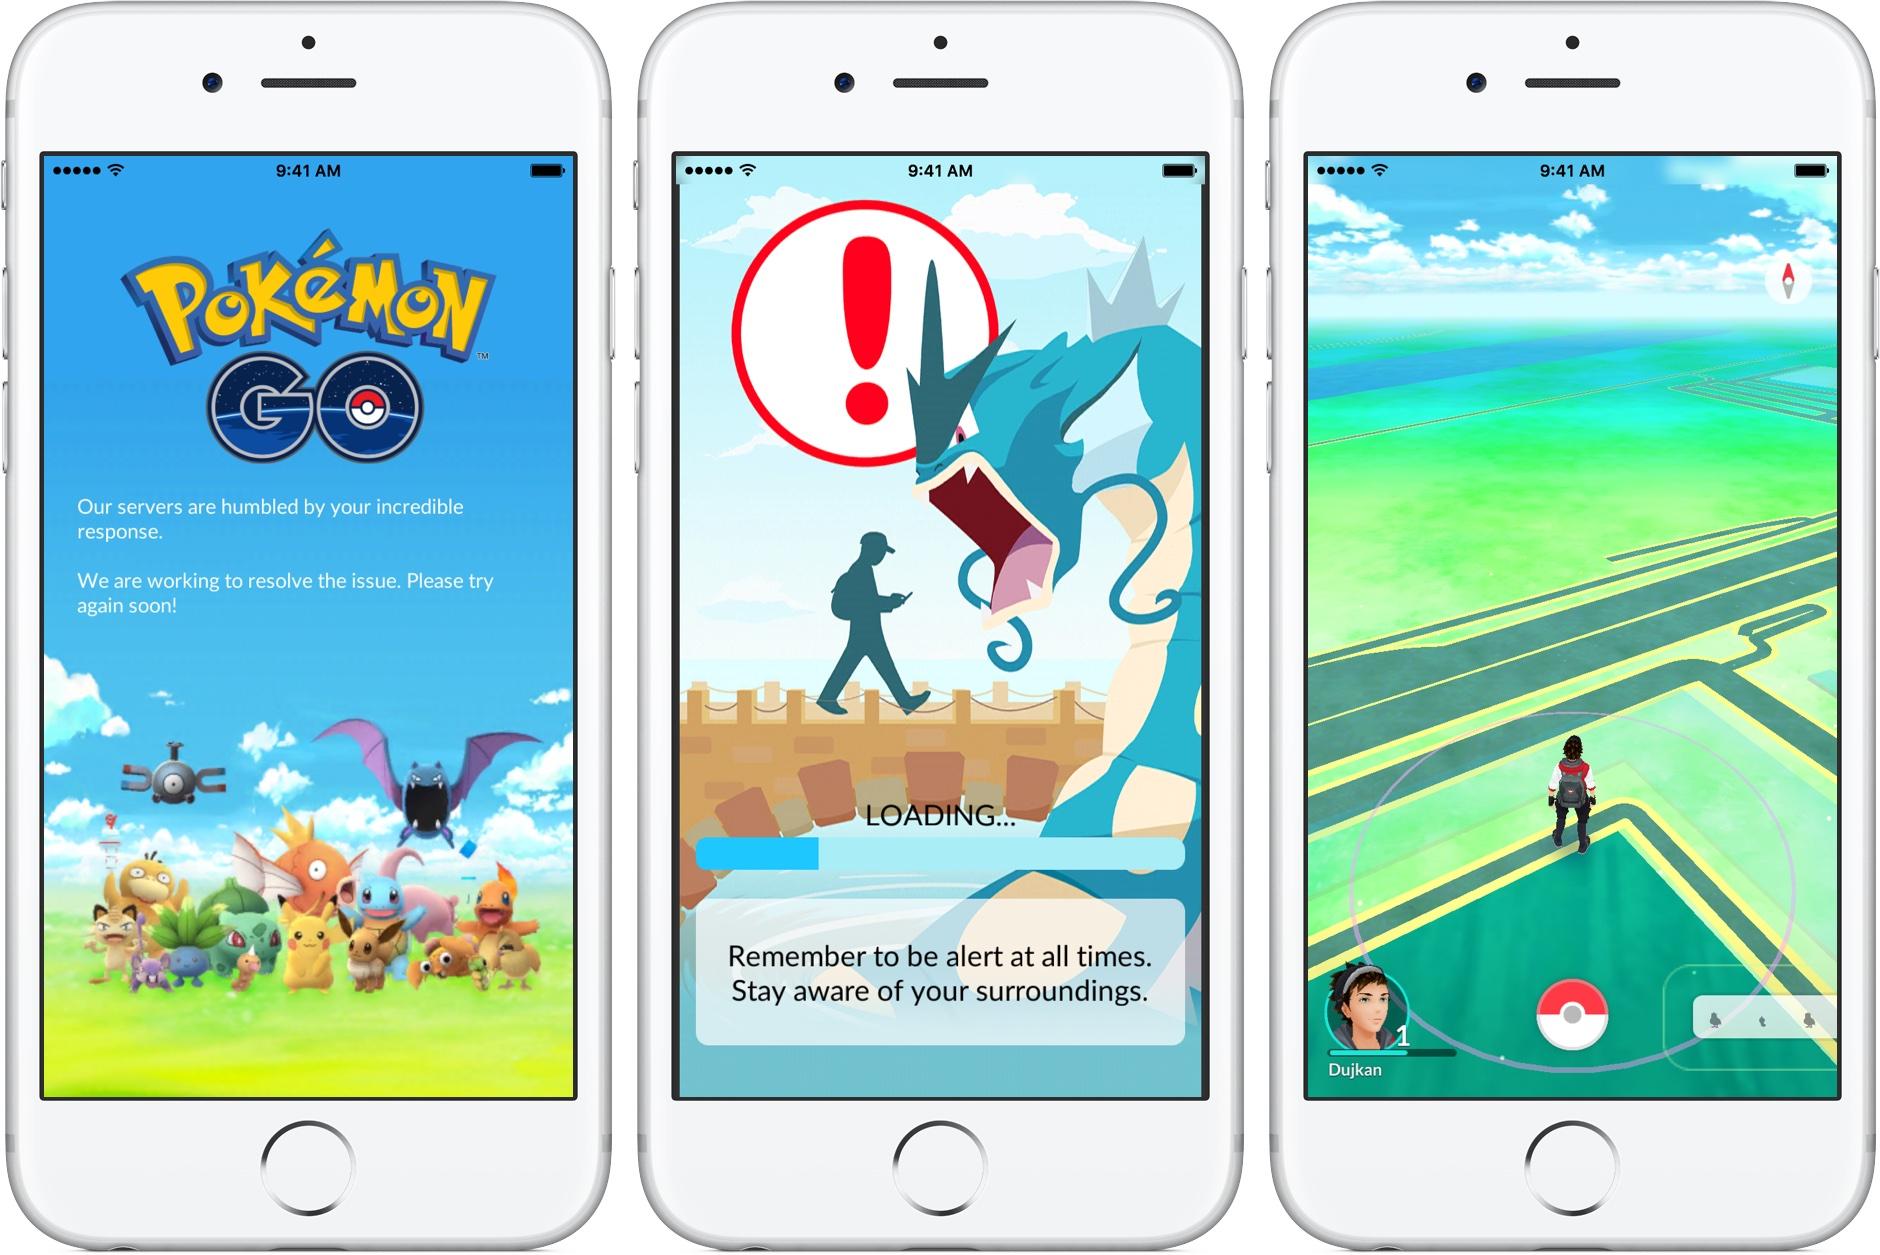 Apple Confirms Pokemon Go Set App Store Record